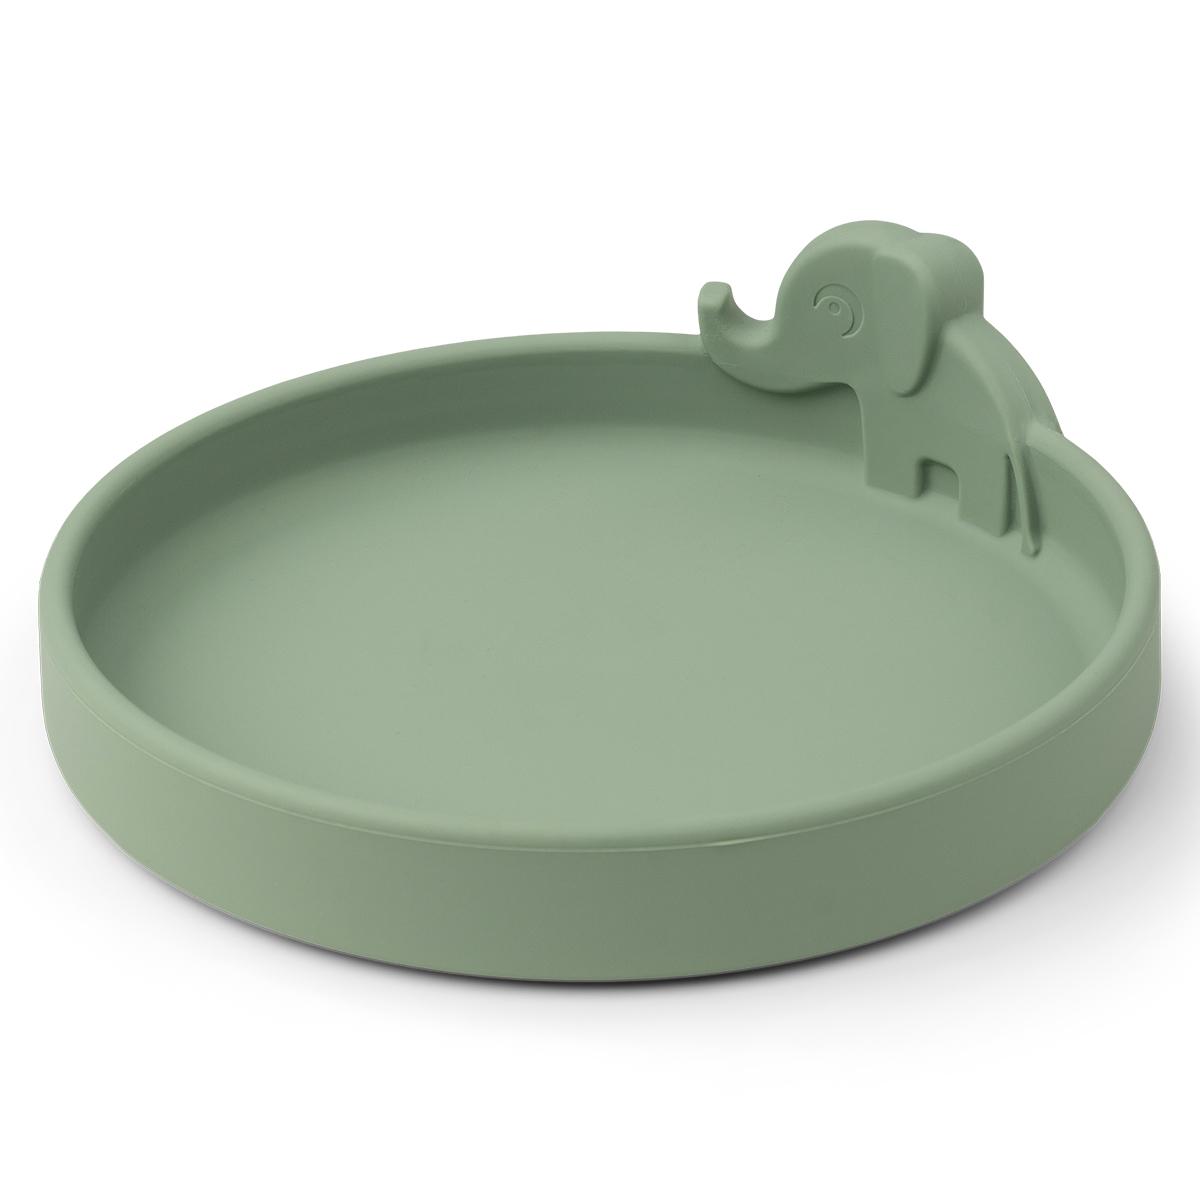 Vaisselle & Couvert Assiette Peekaboo Elphee - Vert Assiette Peekaboo Elphee - Vert